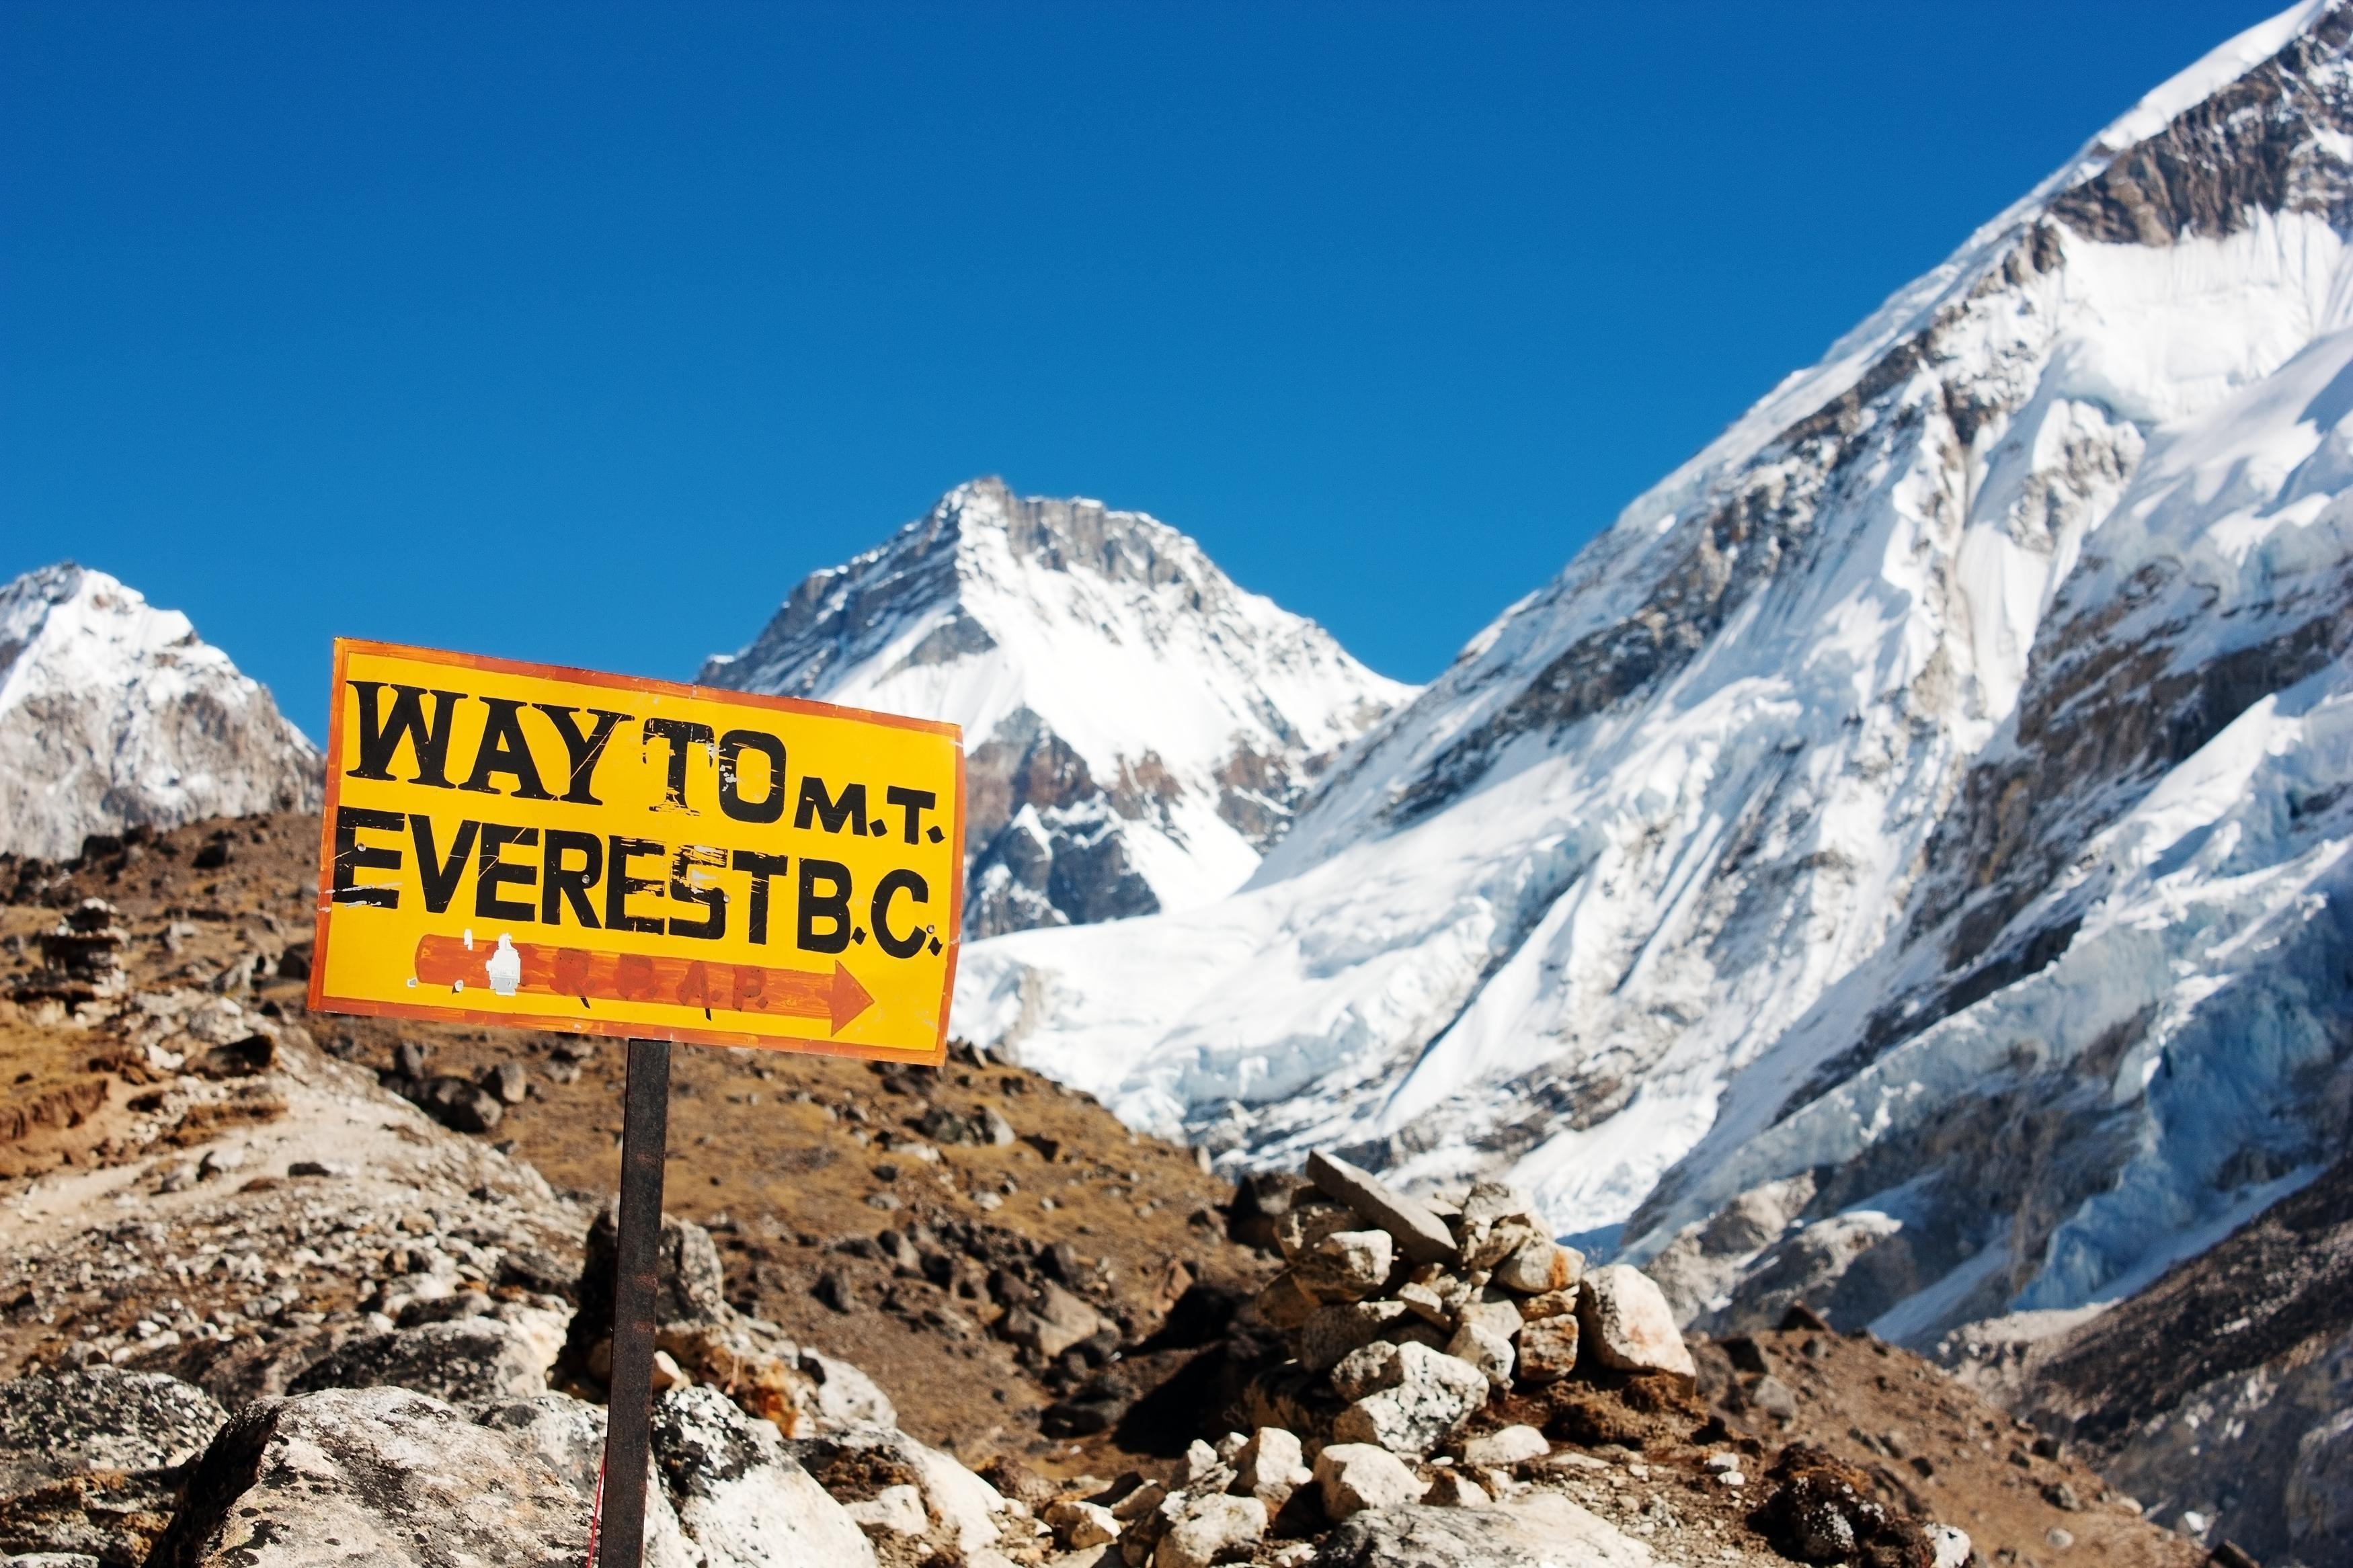 Mt. Everest Tours from Kathmandu